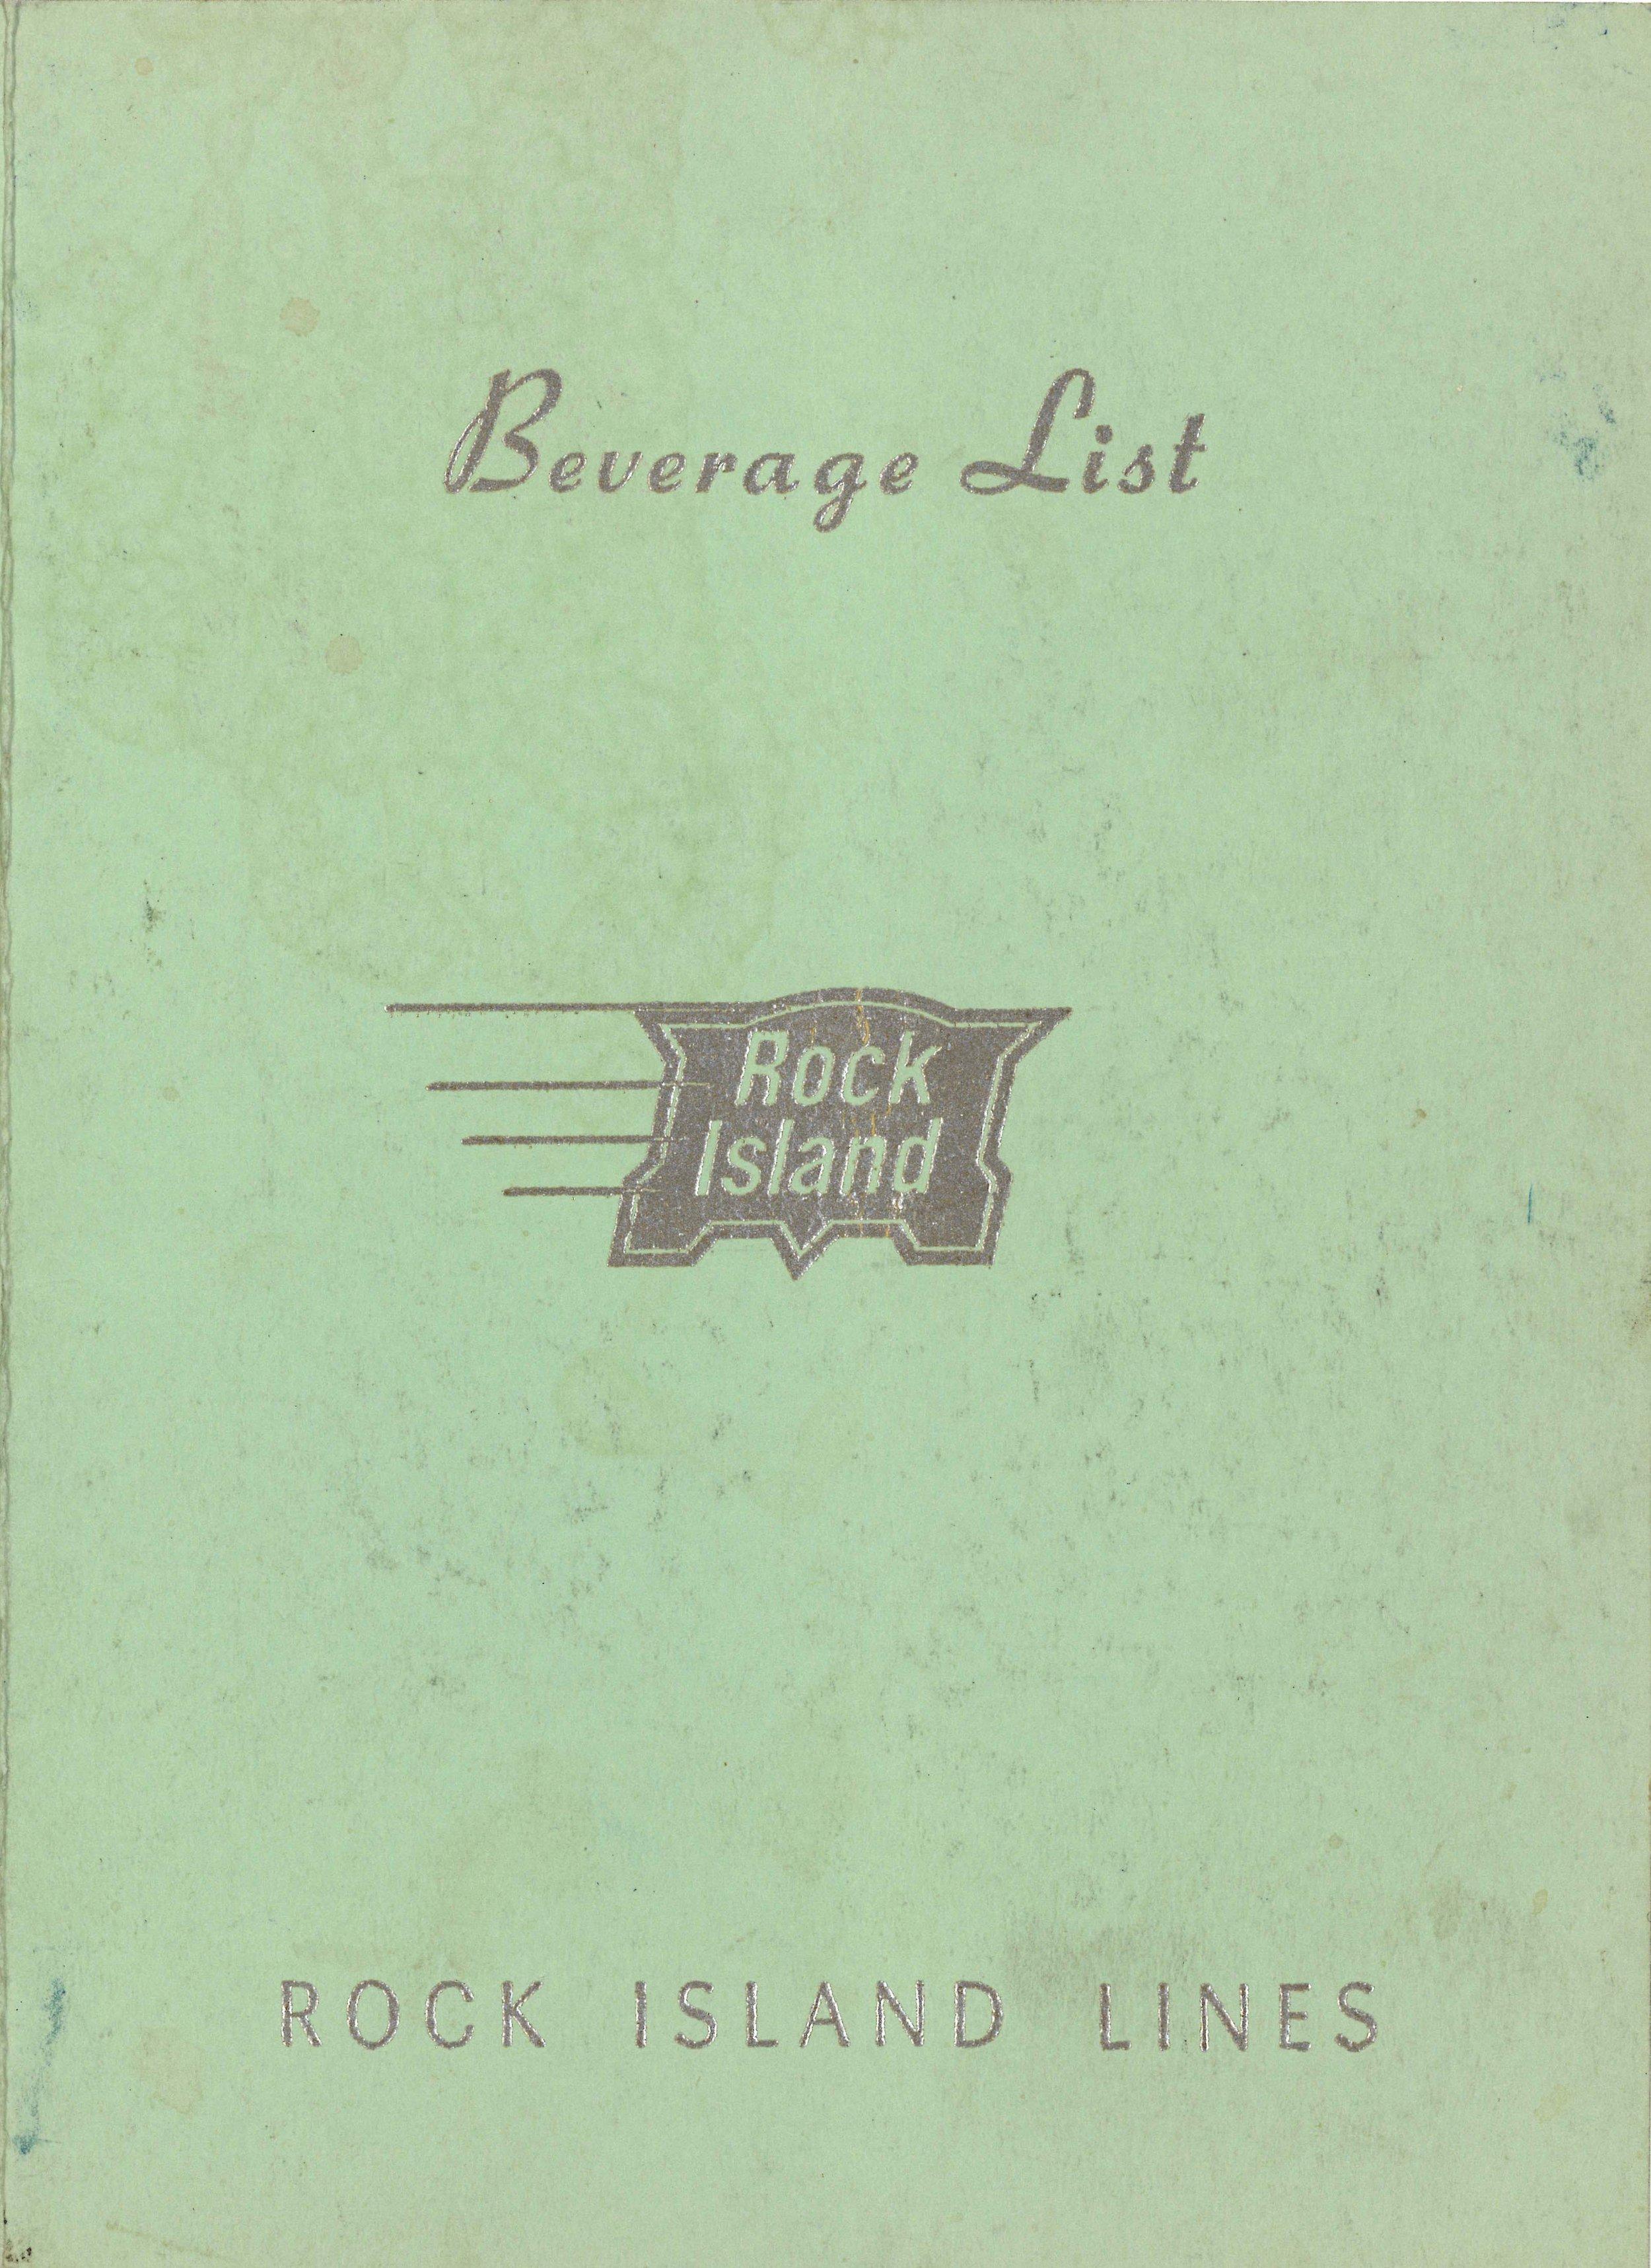 Rock Island Lines Beverage List_Sm1a.jpg